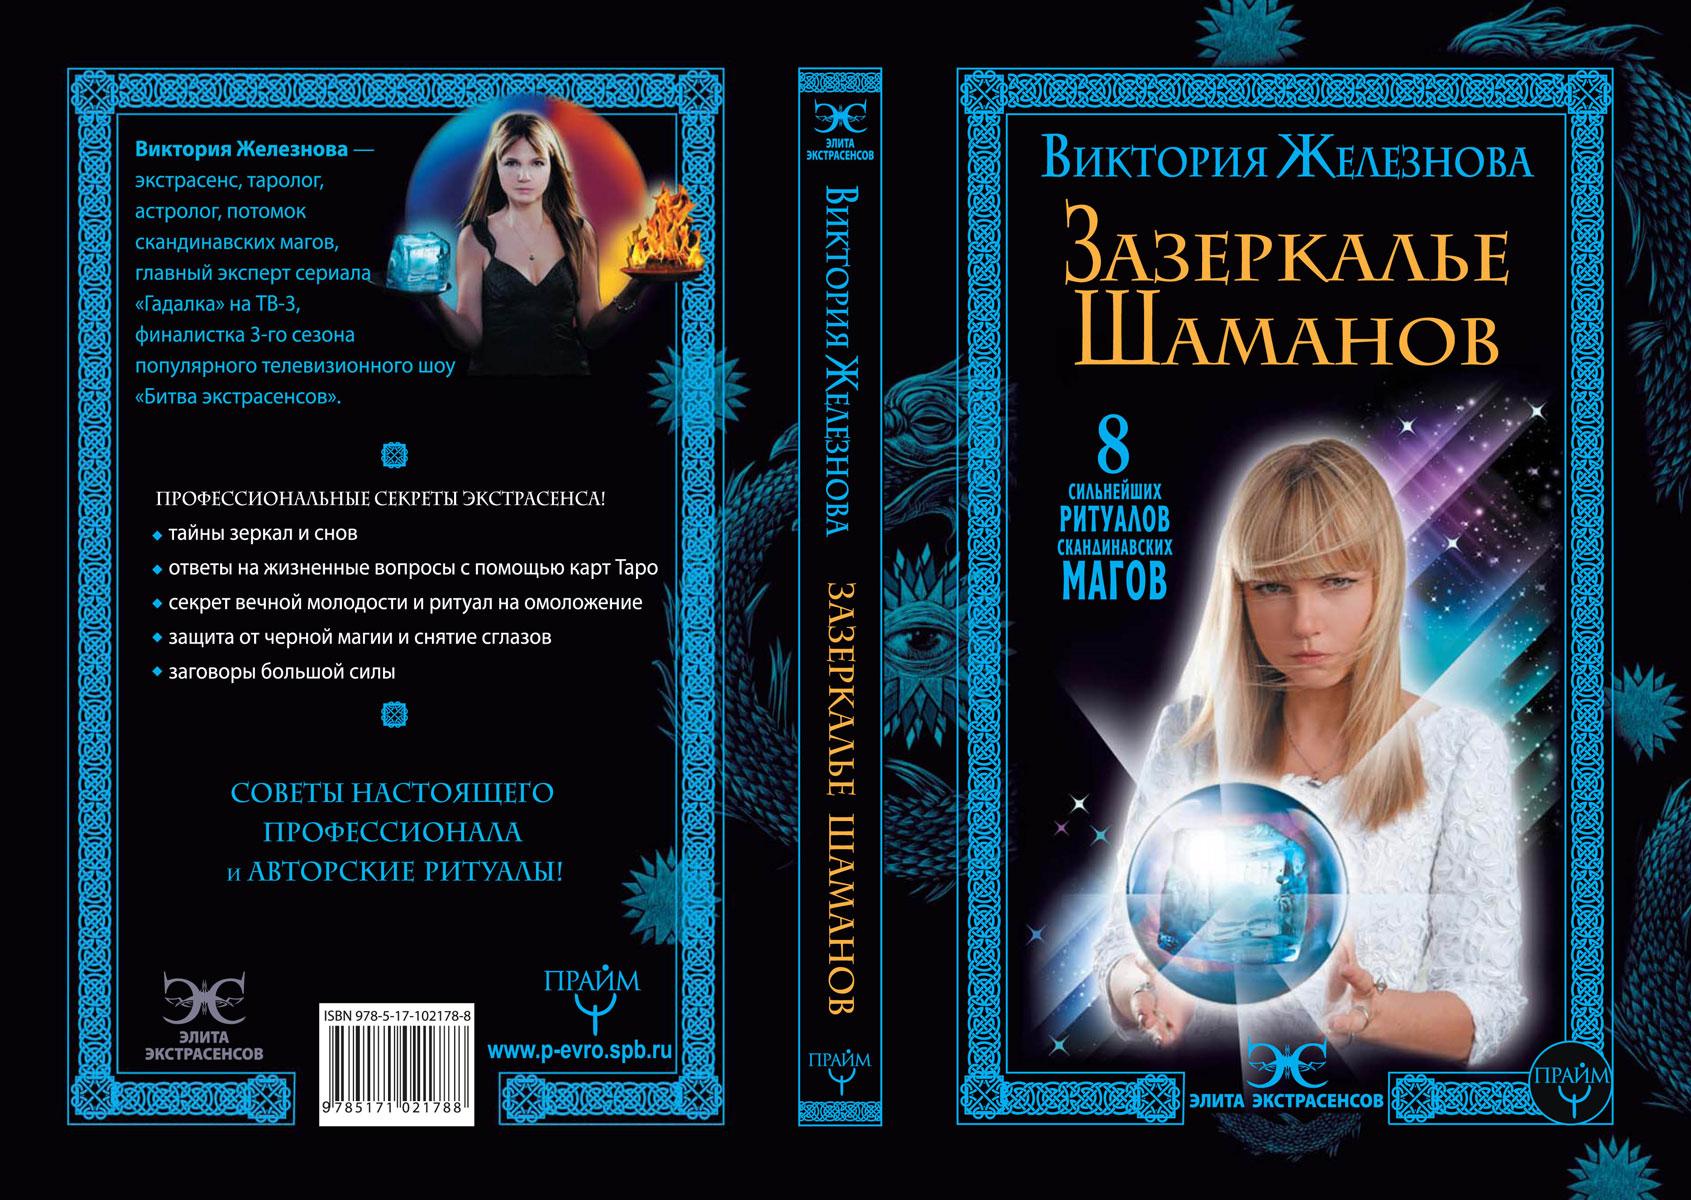 Песни о магии и волшебстве